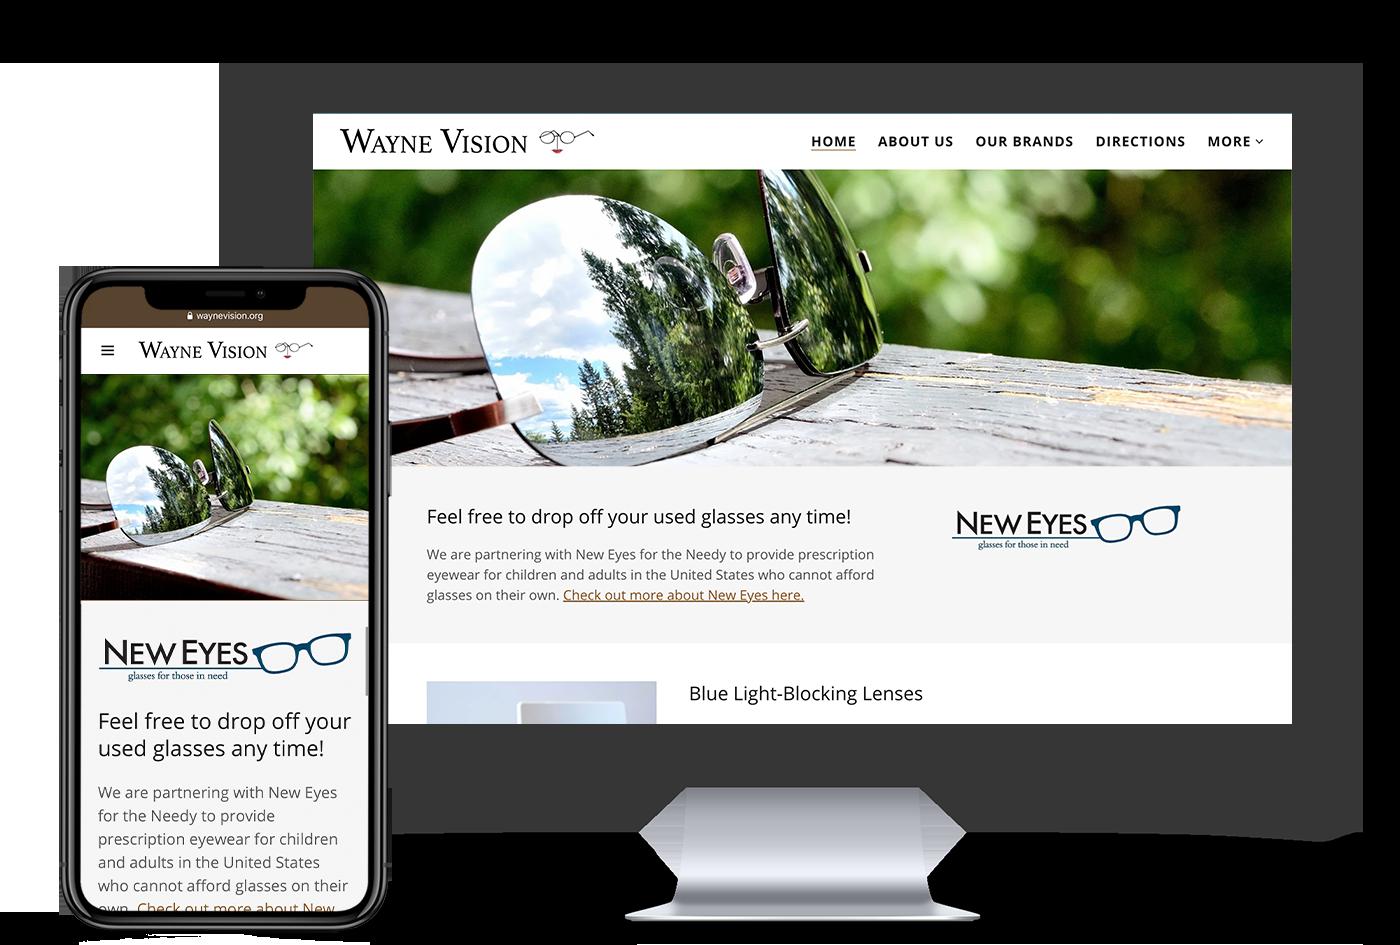 Wayne Vision website